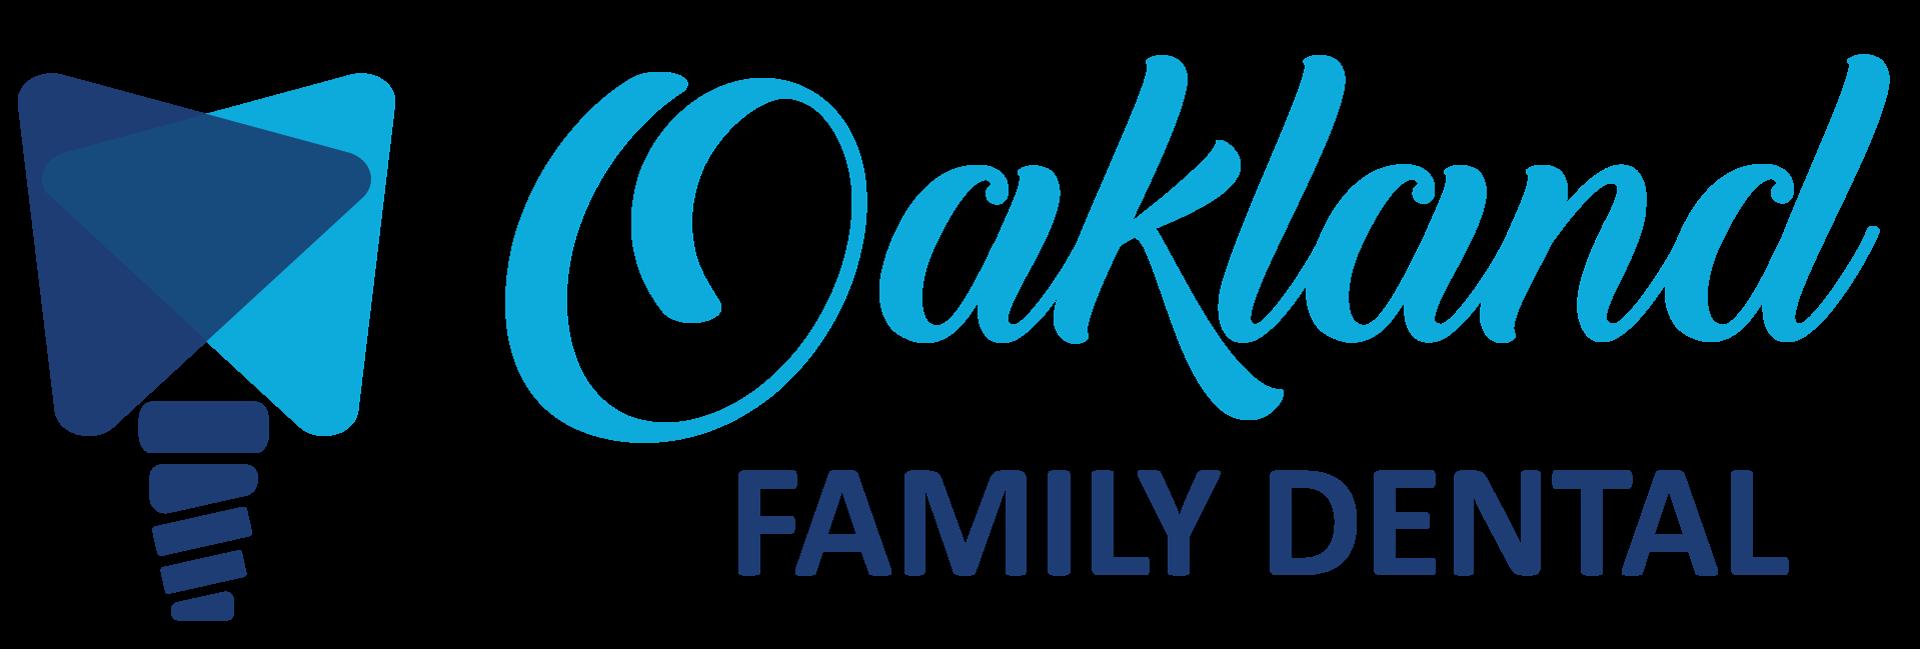 Oakland Family Dental